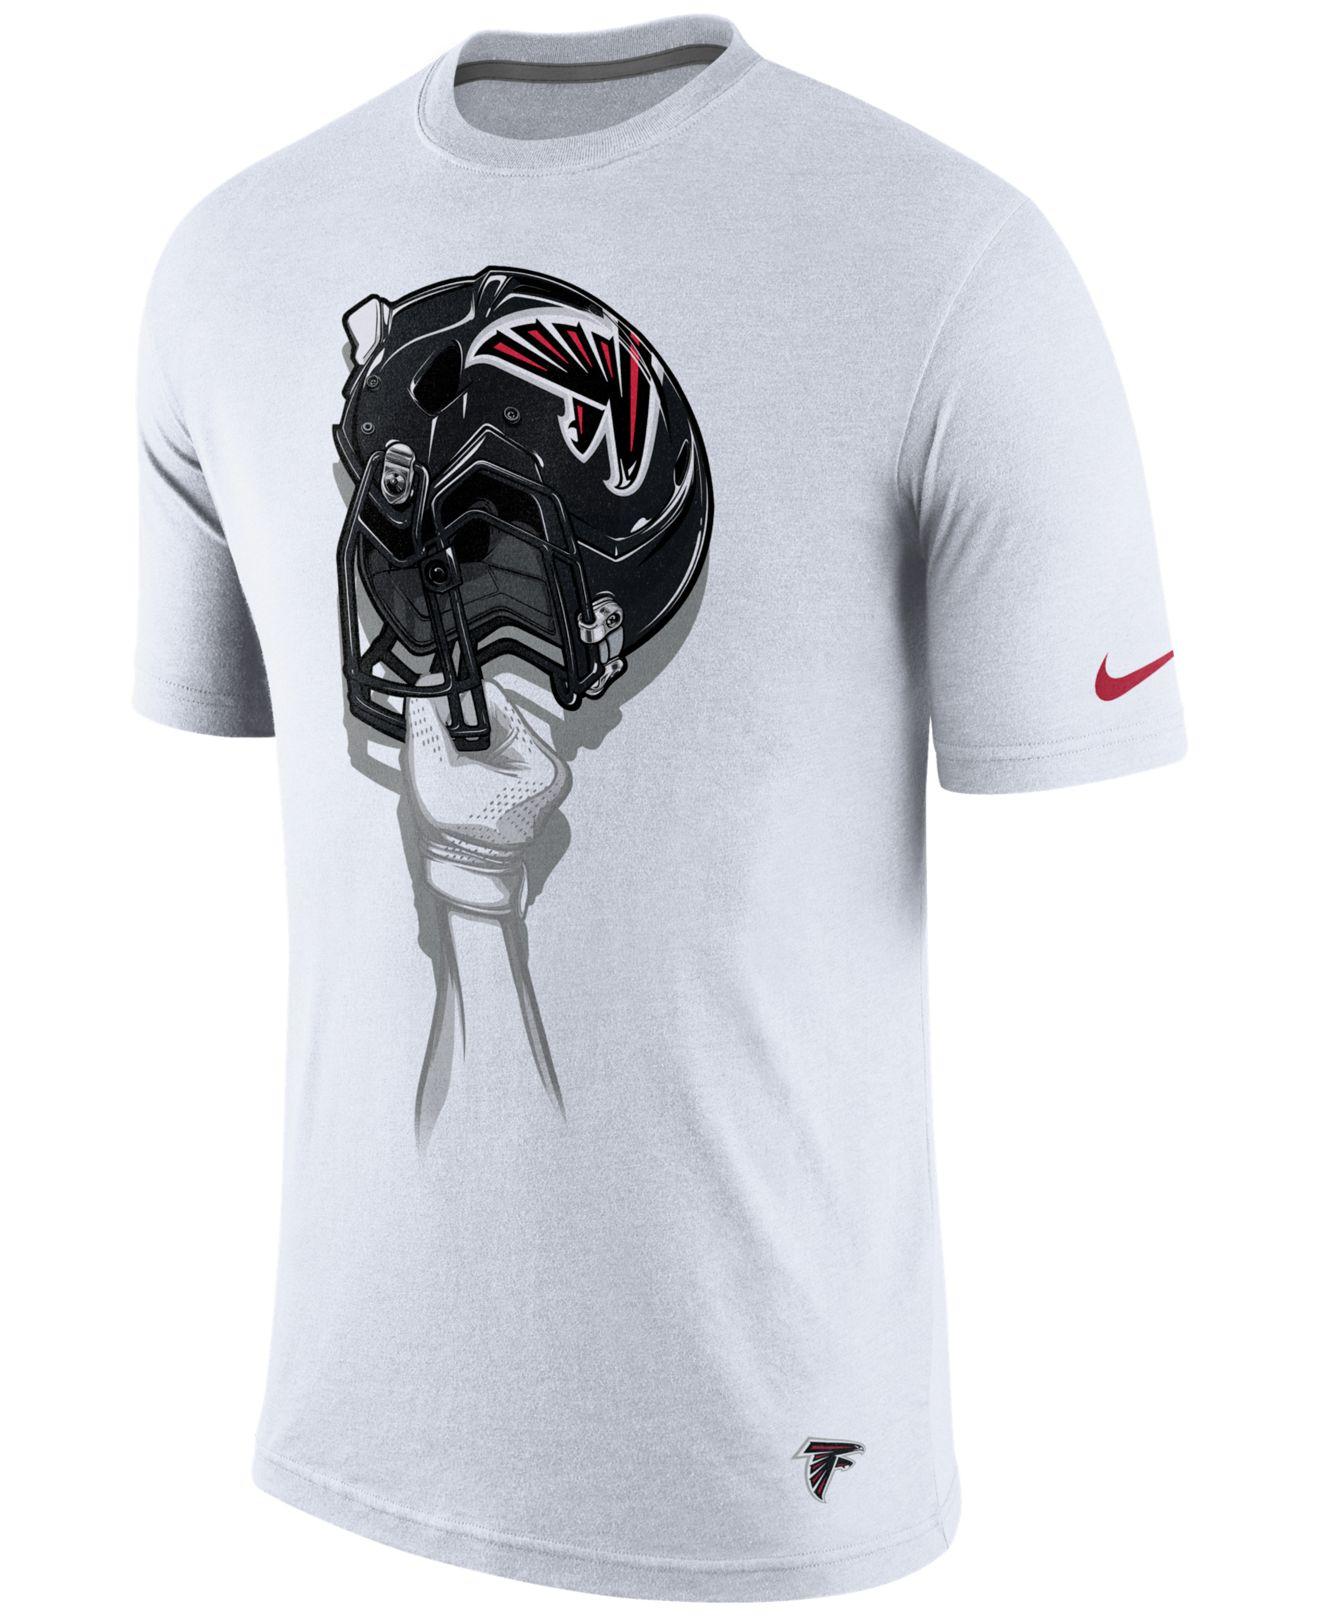 Atlanta Falcons Fotball Team Logo White T-Shirt Tee